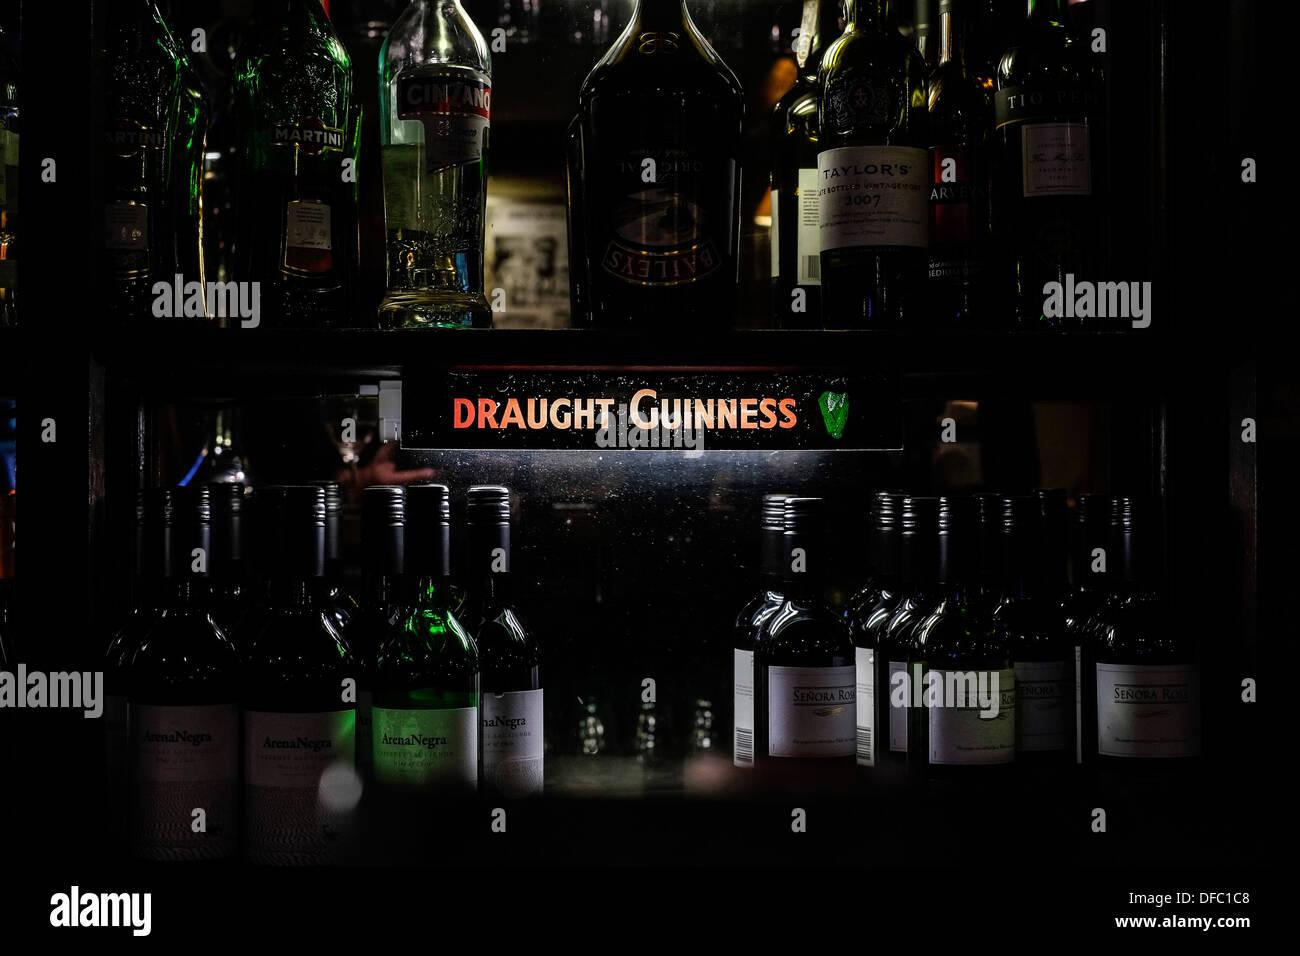 subdued lighting led subdued lighting illuminating various bottles of wine in pub stock image lighting photos images alamy